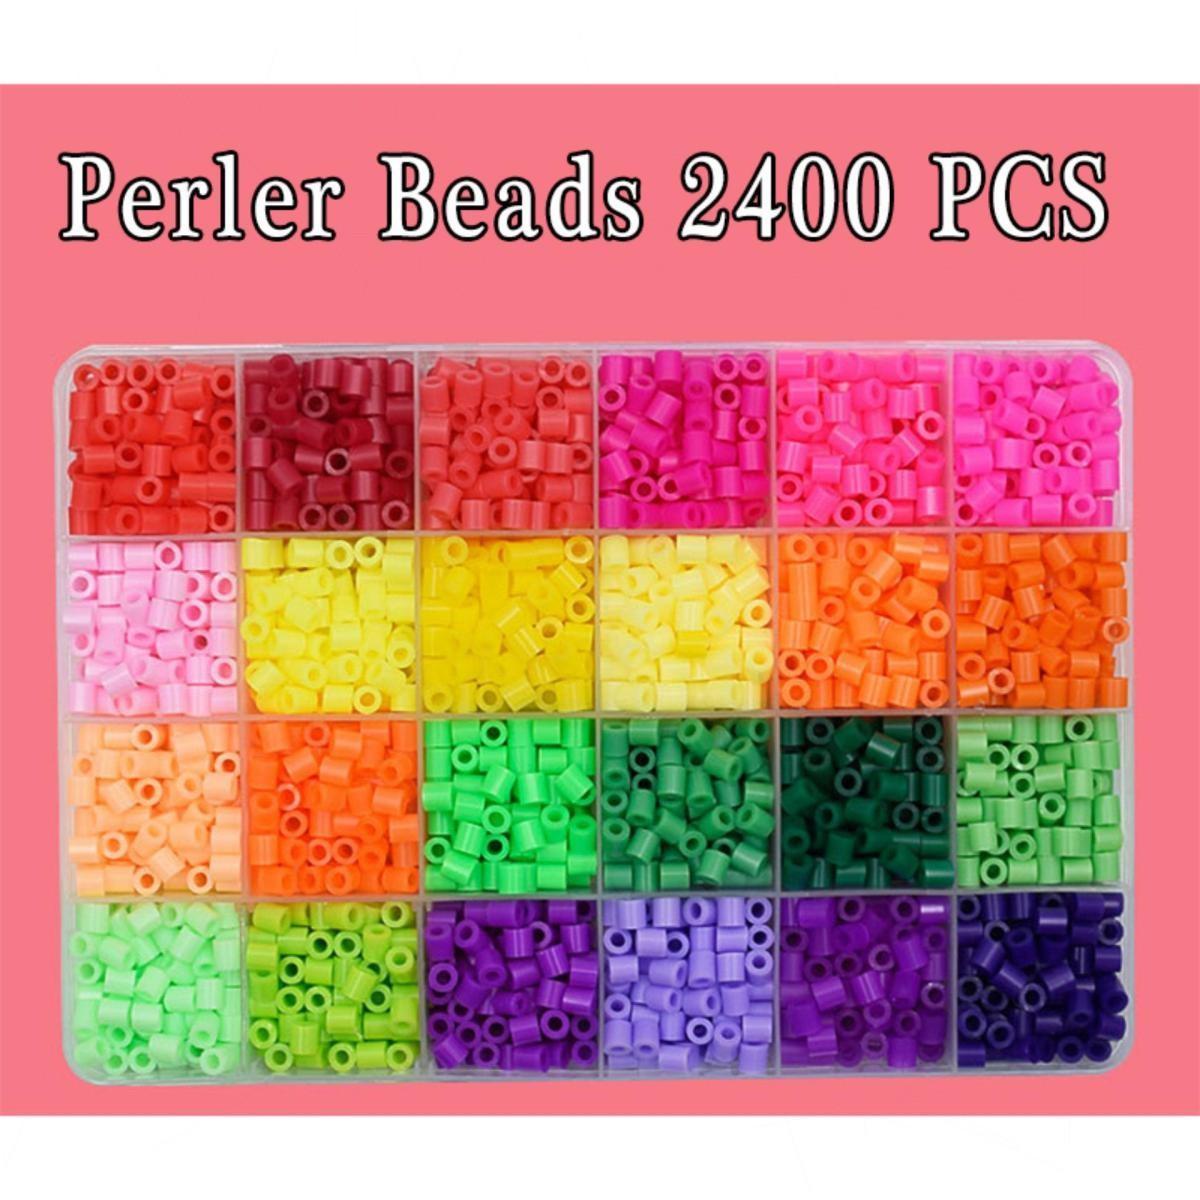 Perler Beads Fused Bead Kit 2400 Beads Craft Beads For Kids By Tcgbhvkog.